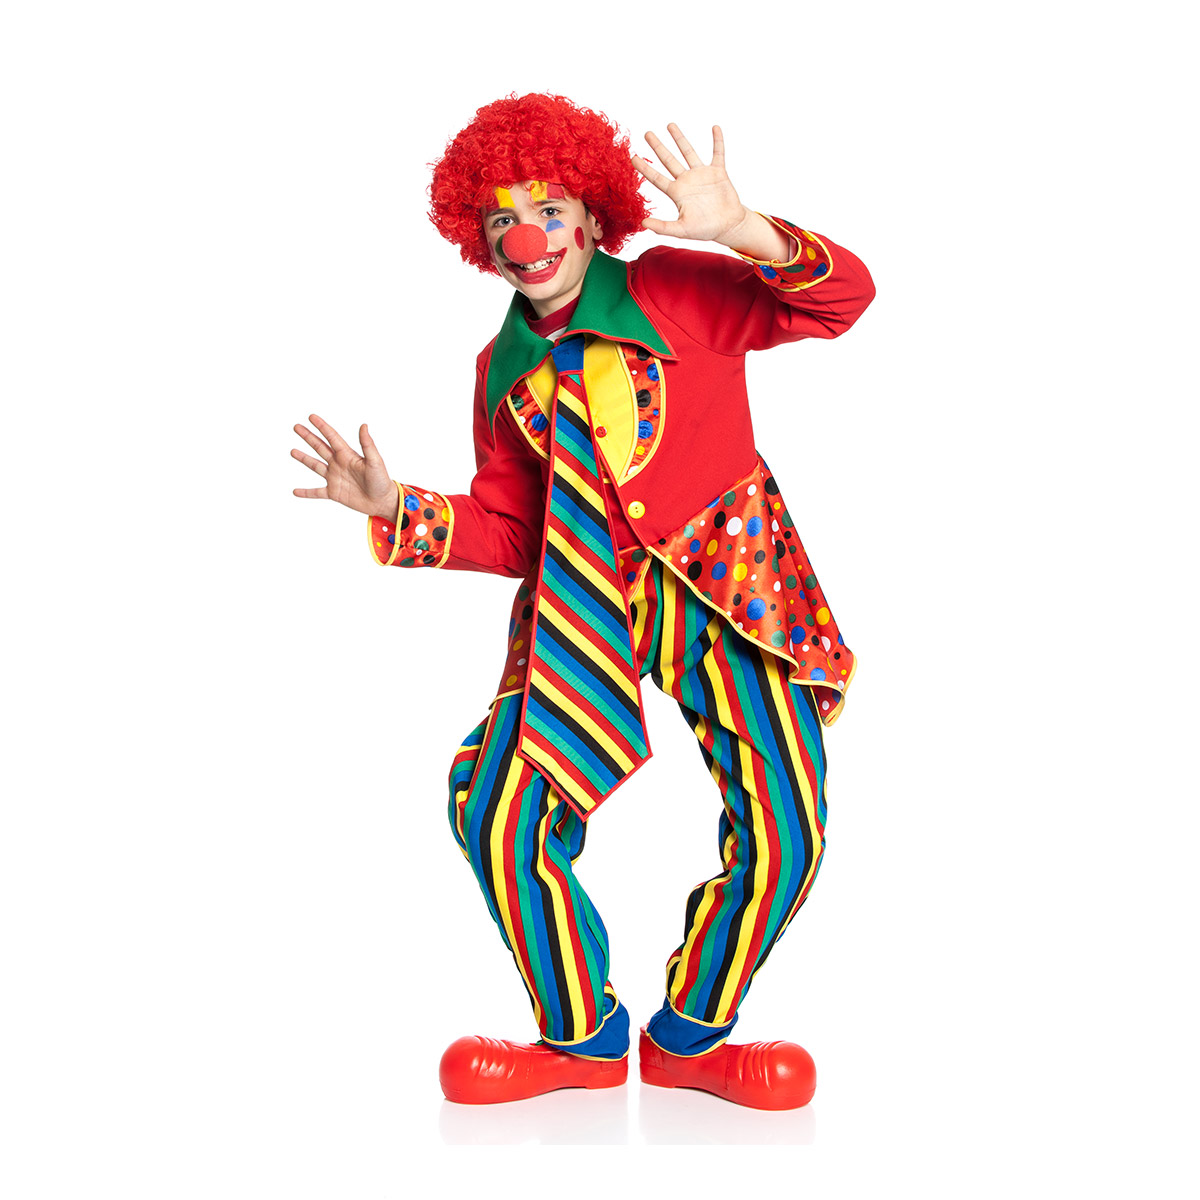 clownkost m kinder bunt komplett karneval kinderkost m kost mplanet. Black Bedroom Furniture Sets. Home Design Ideas